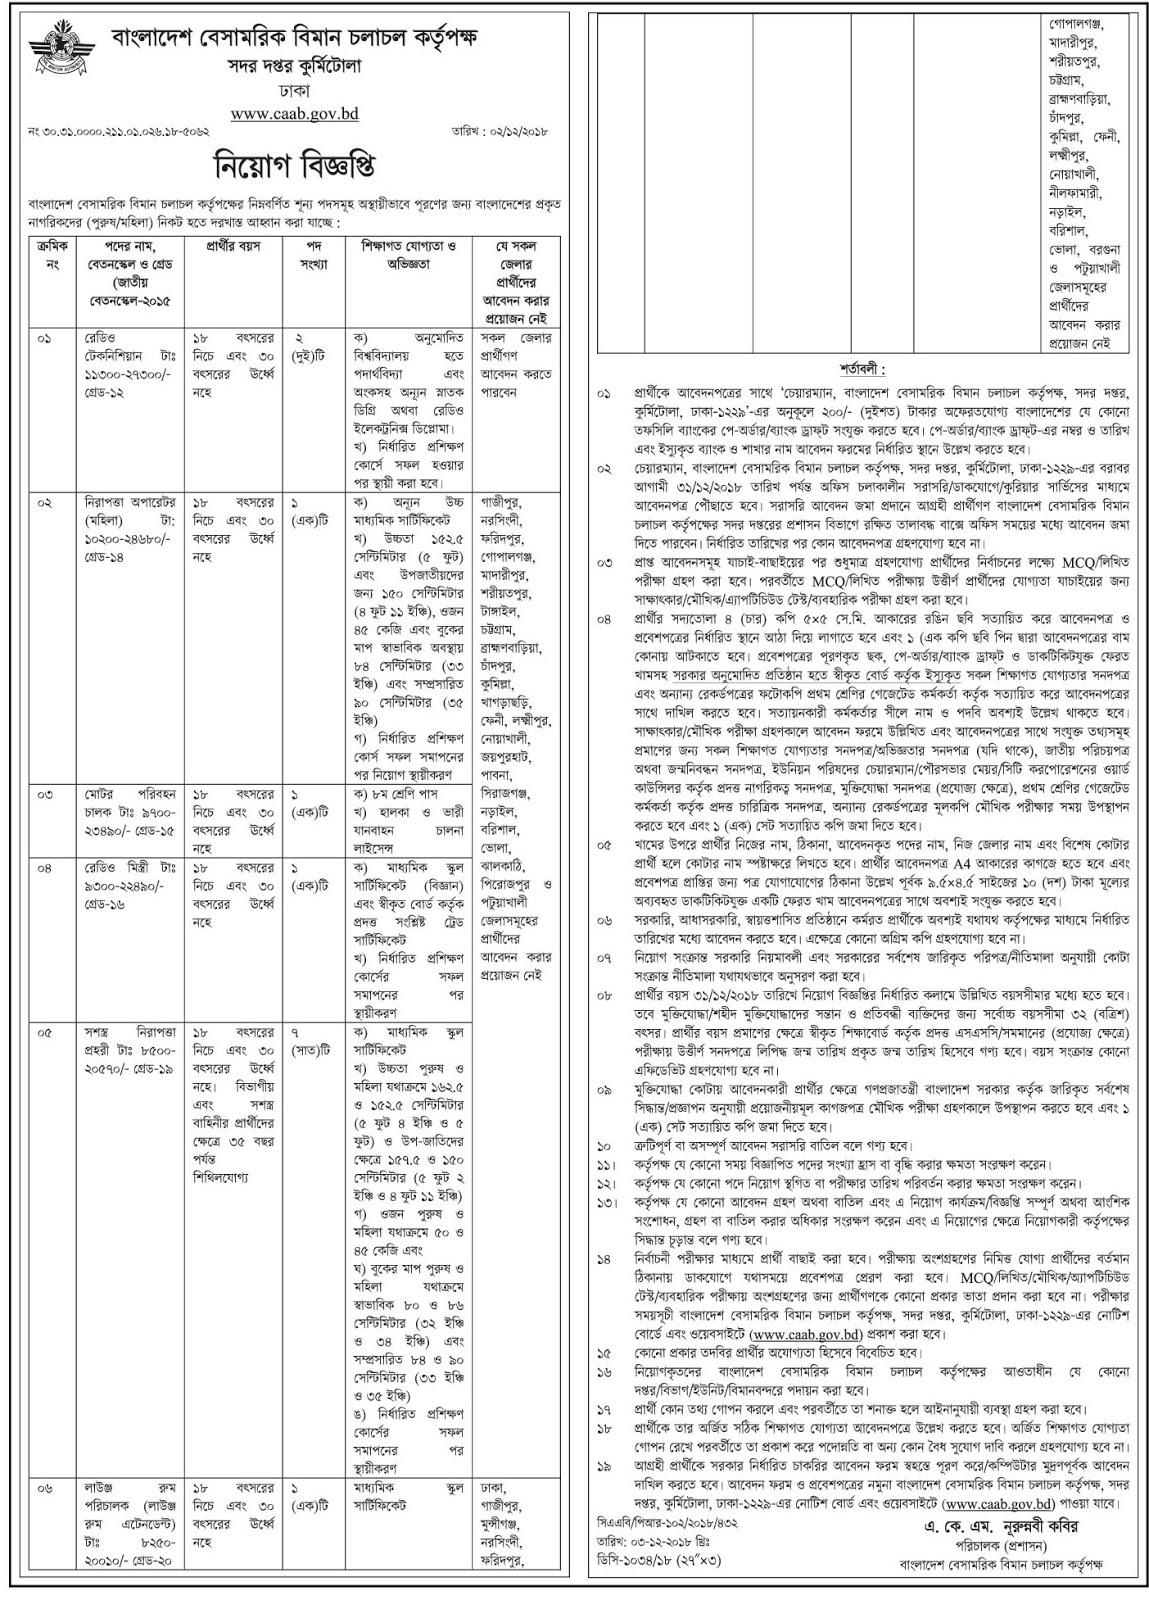 Civil Aviation Authority of Bangladesh (Caab) Job Circular 2018